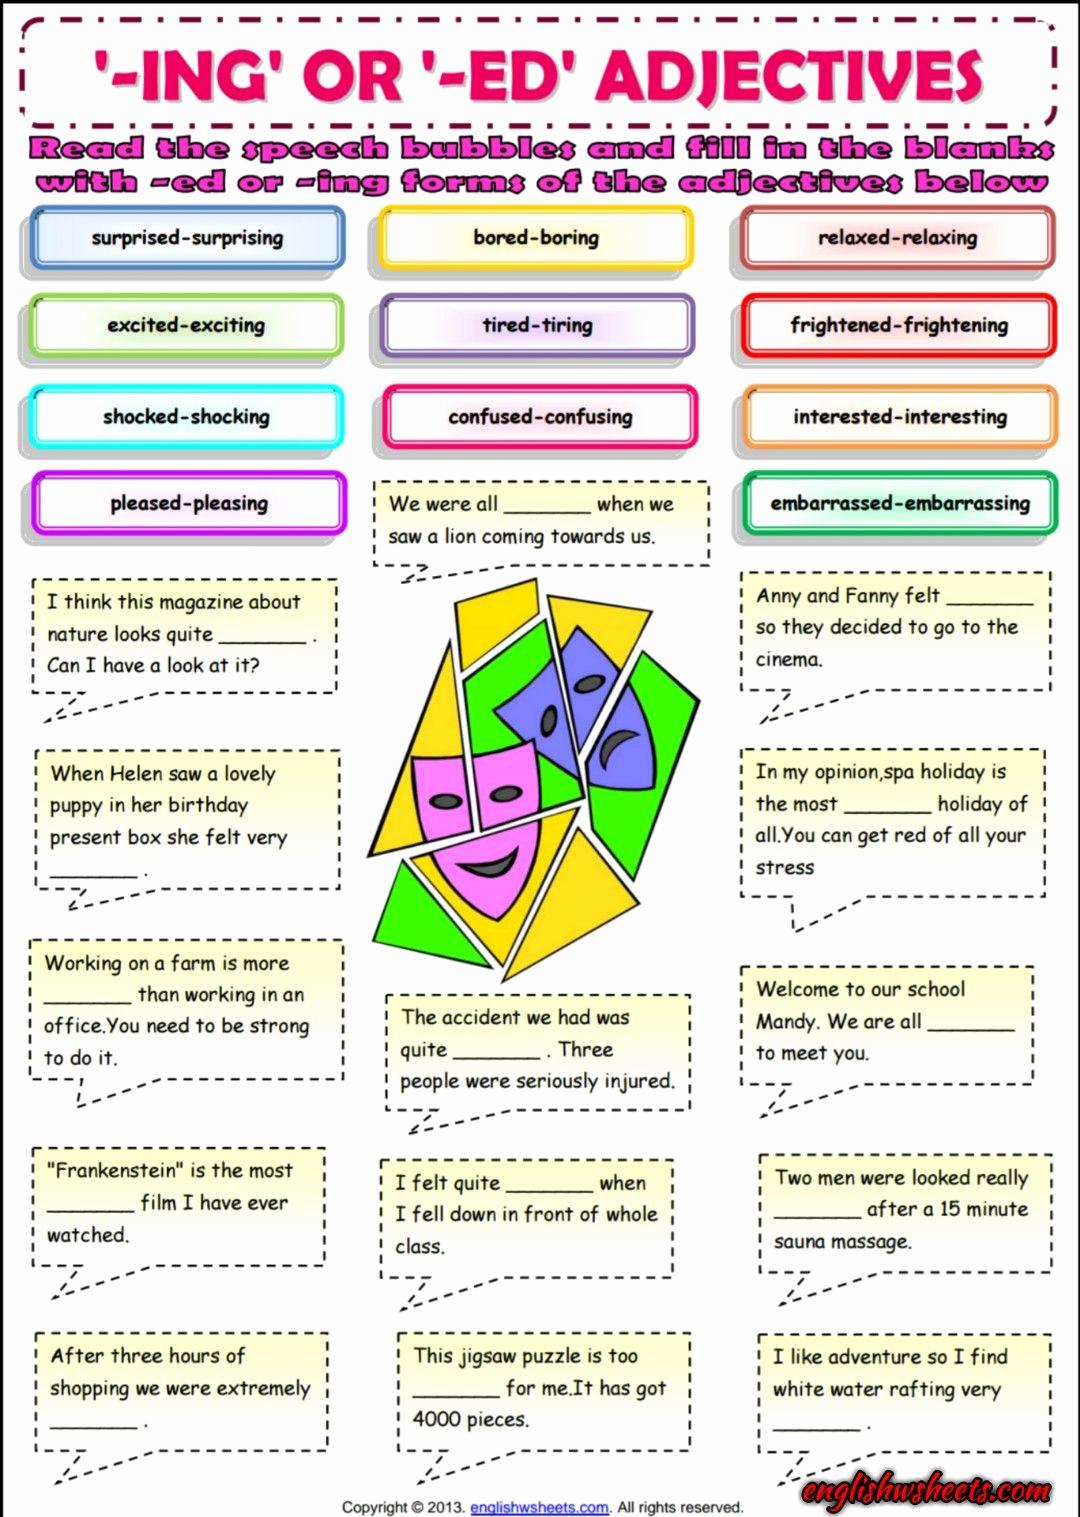 Ed and Ing Worksheets Best Of Ing or Ed Adjectives Esl Grammar Exercise Worksheet